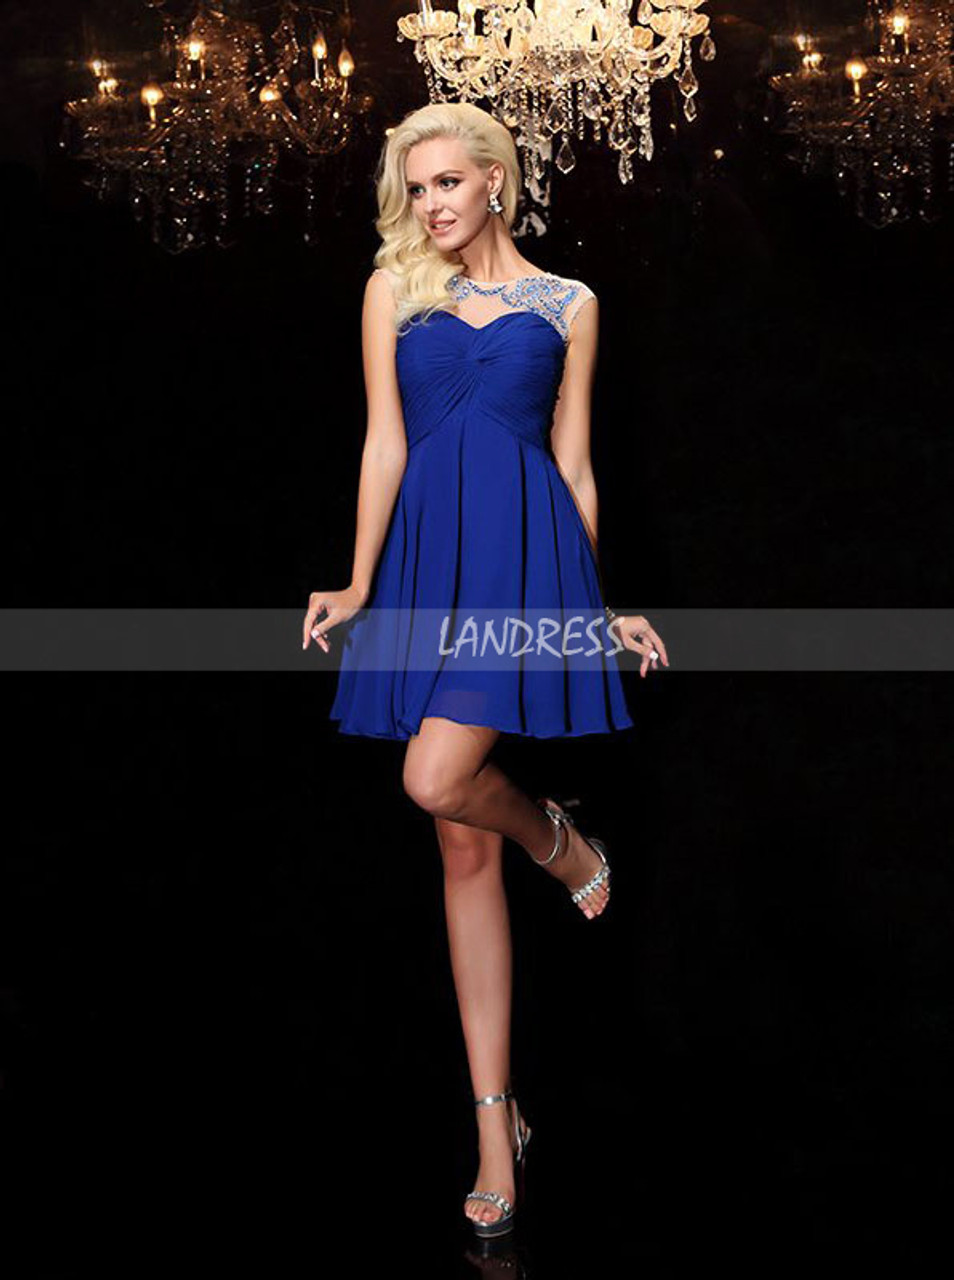 444a41e130d ... Royal Blue Chiffon Cocktail Dresses